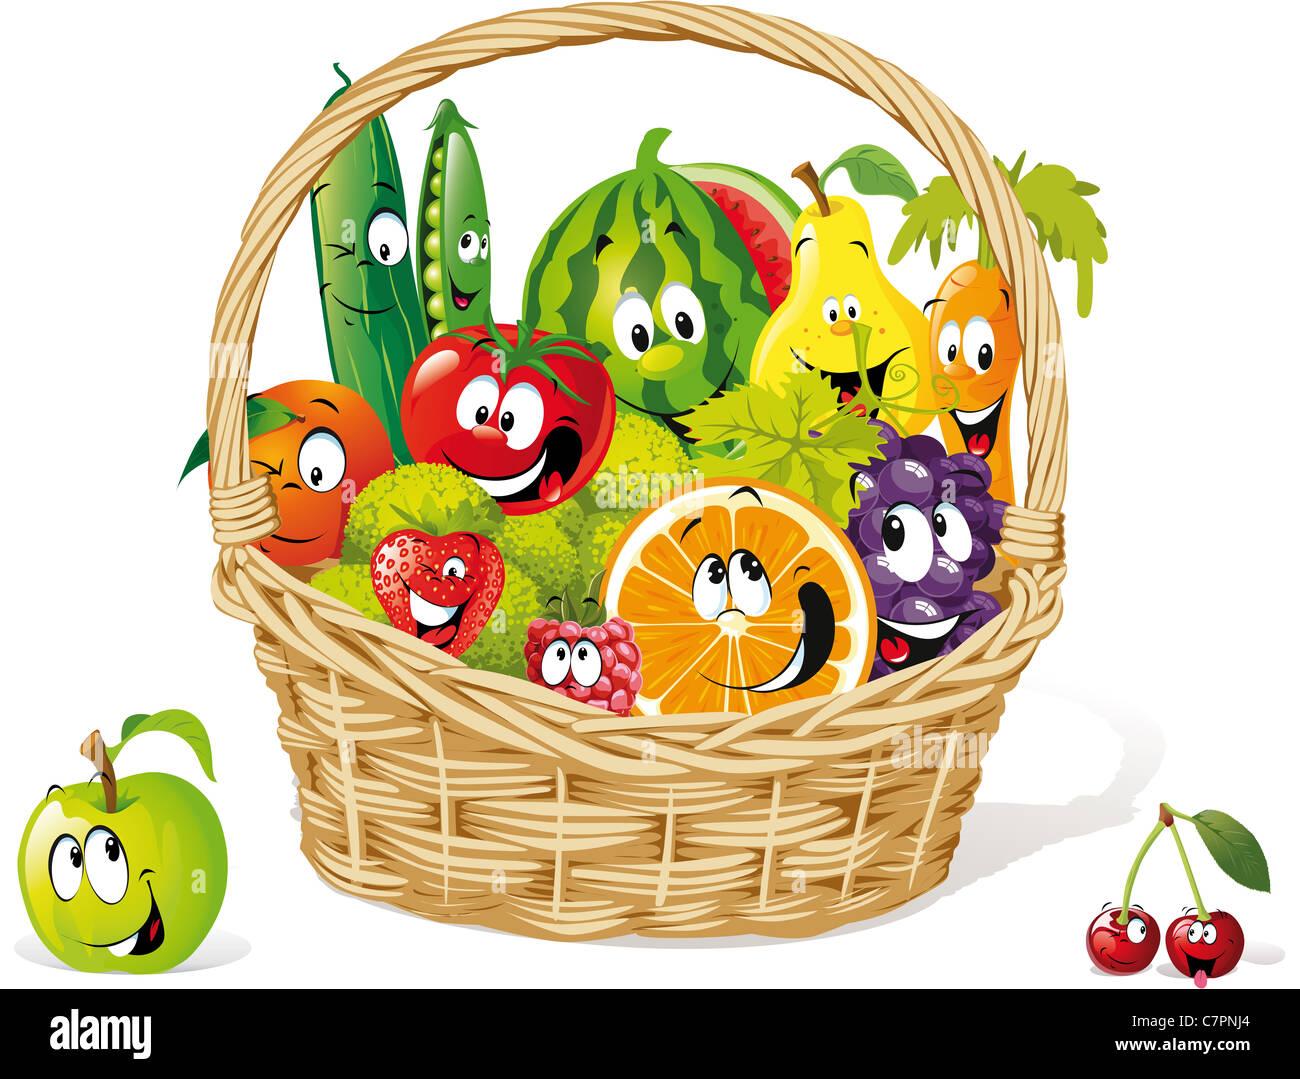 basket of happy fruit and vegetable illustration - Stock Image